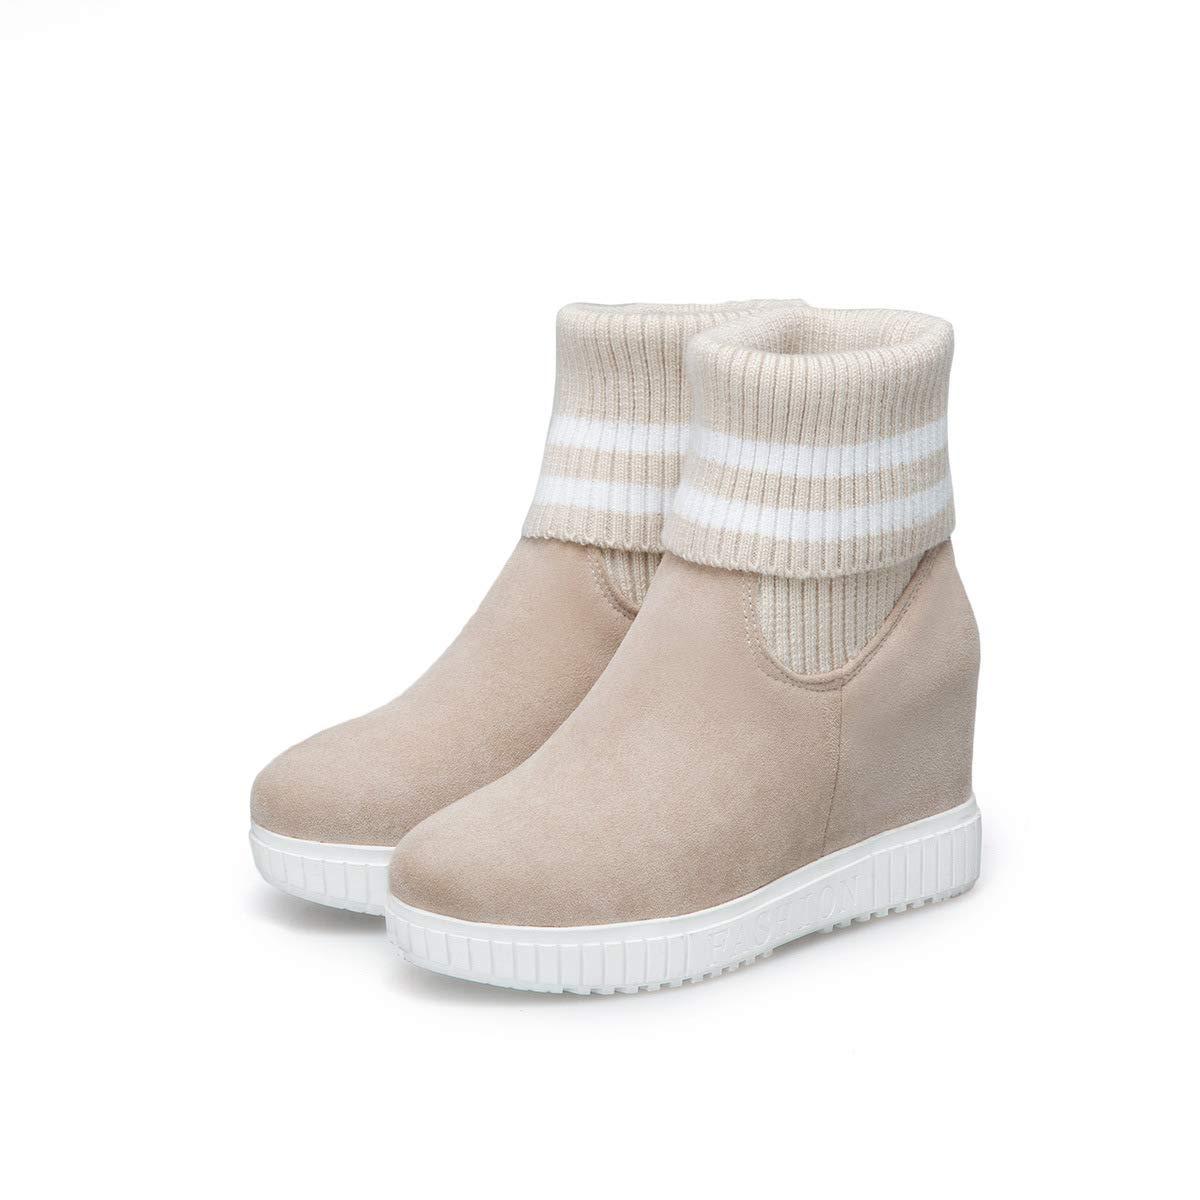 Dicker Dicker Dicker Chunky Heel-Absatz aus Knitting Mid für Damen 323586